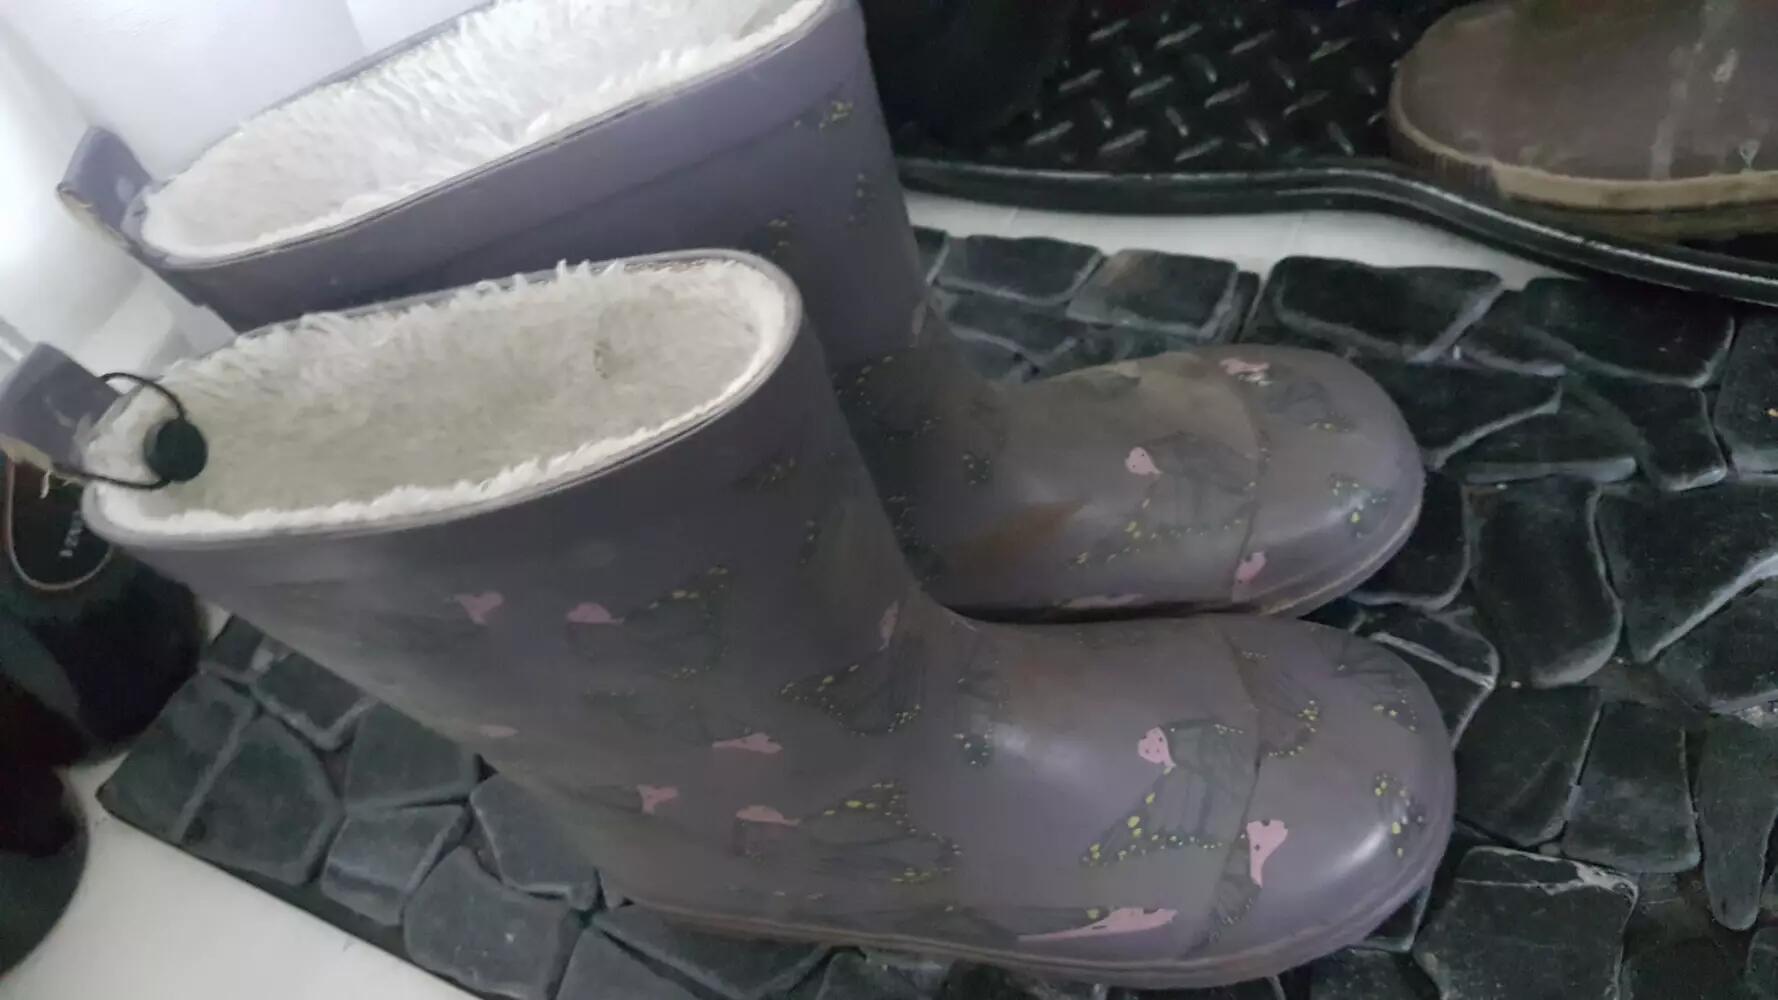 Friends Varm gummistøvler